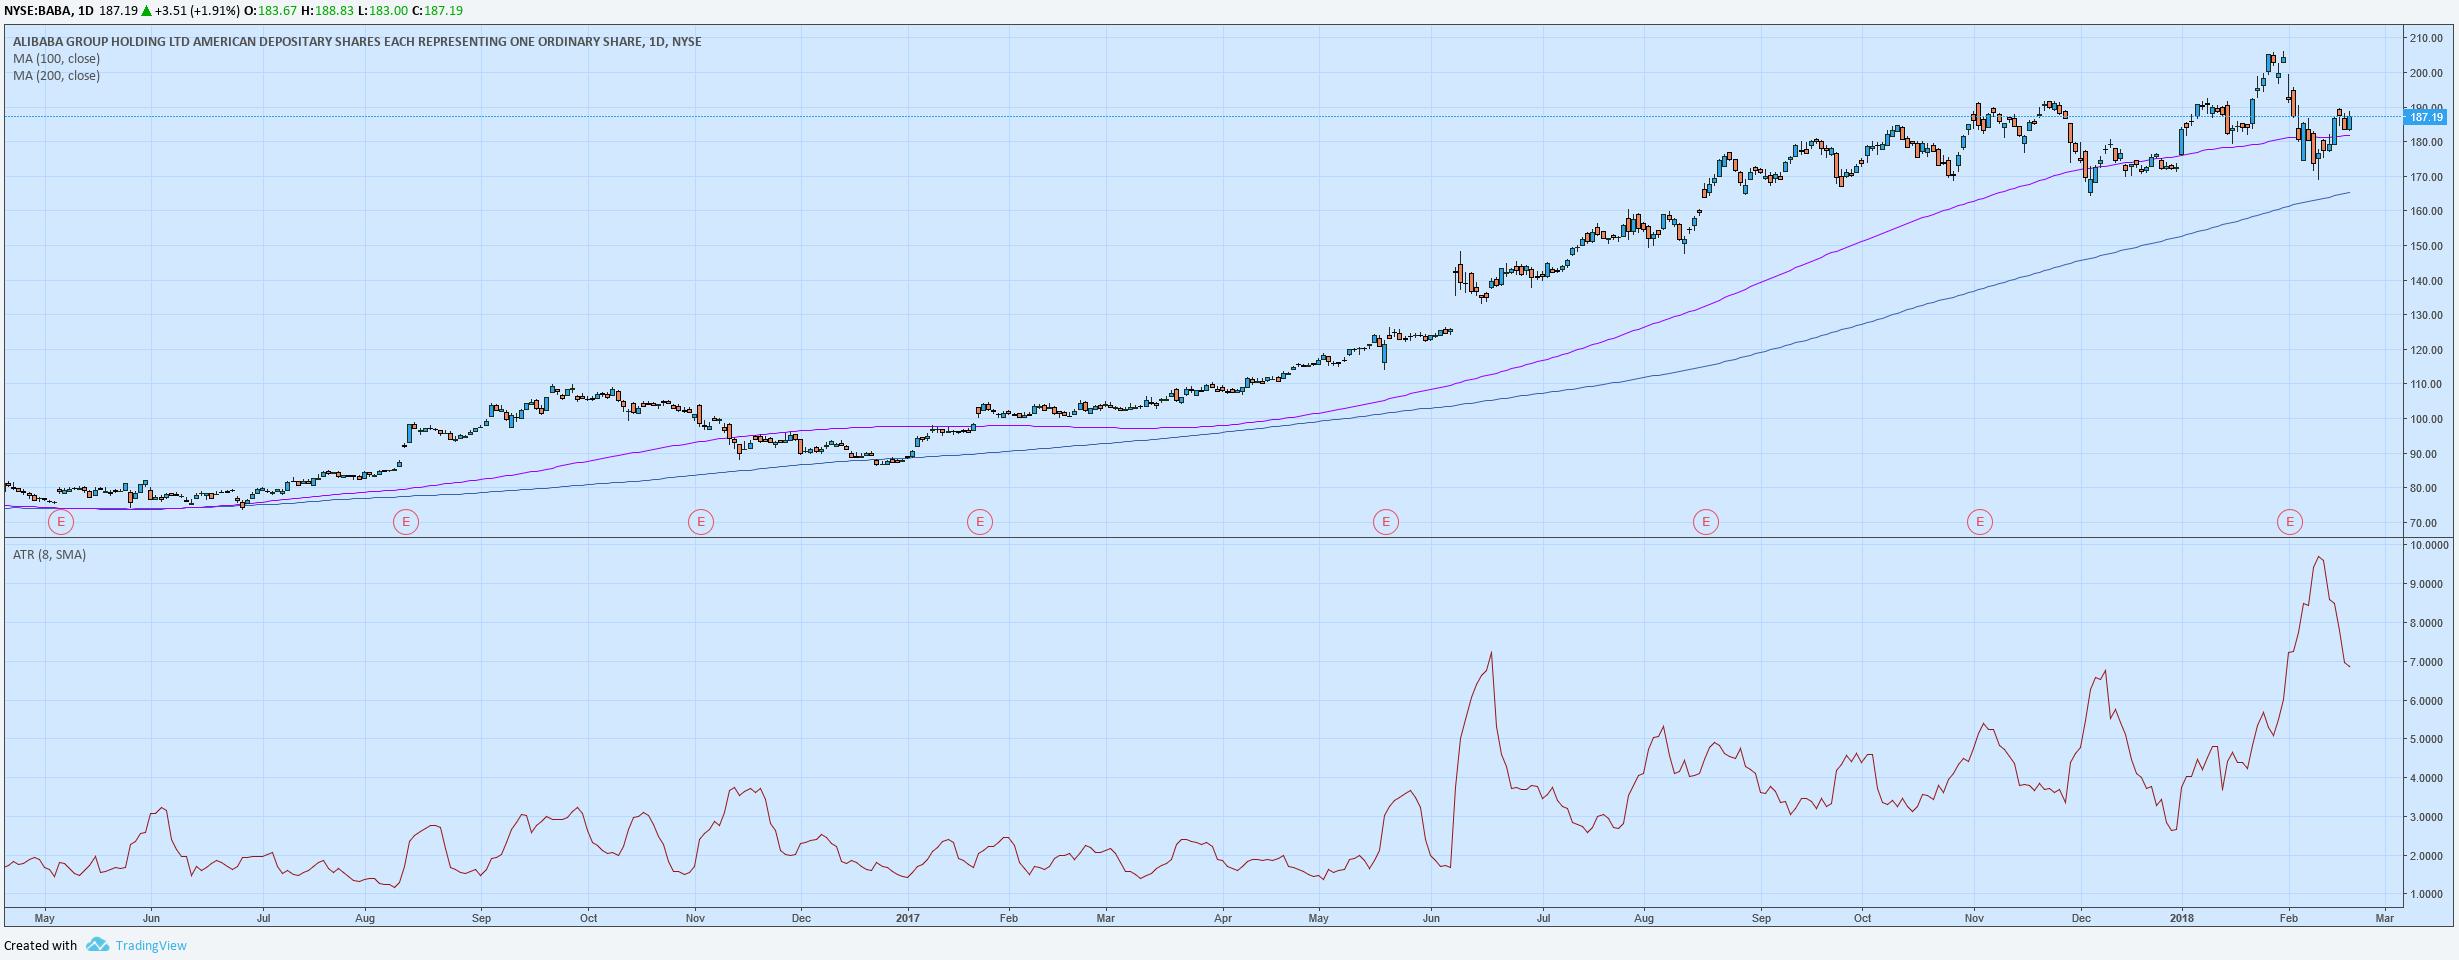 BABA historically most volatile stock